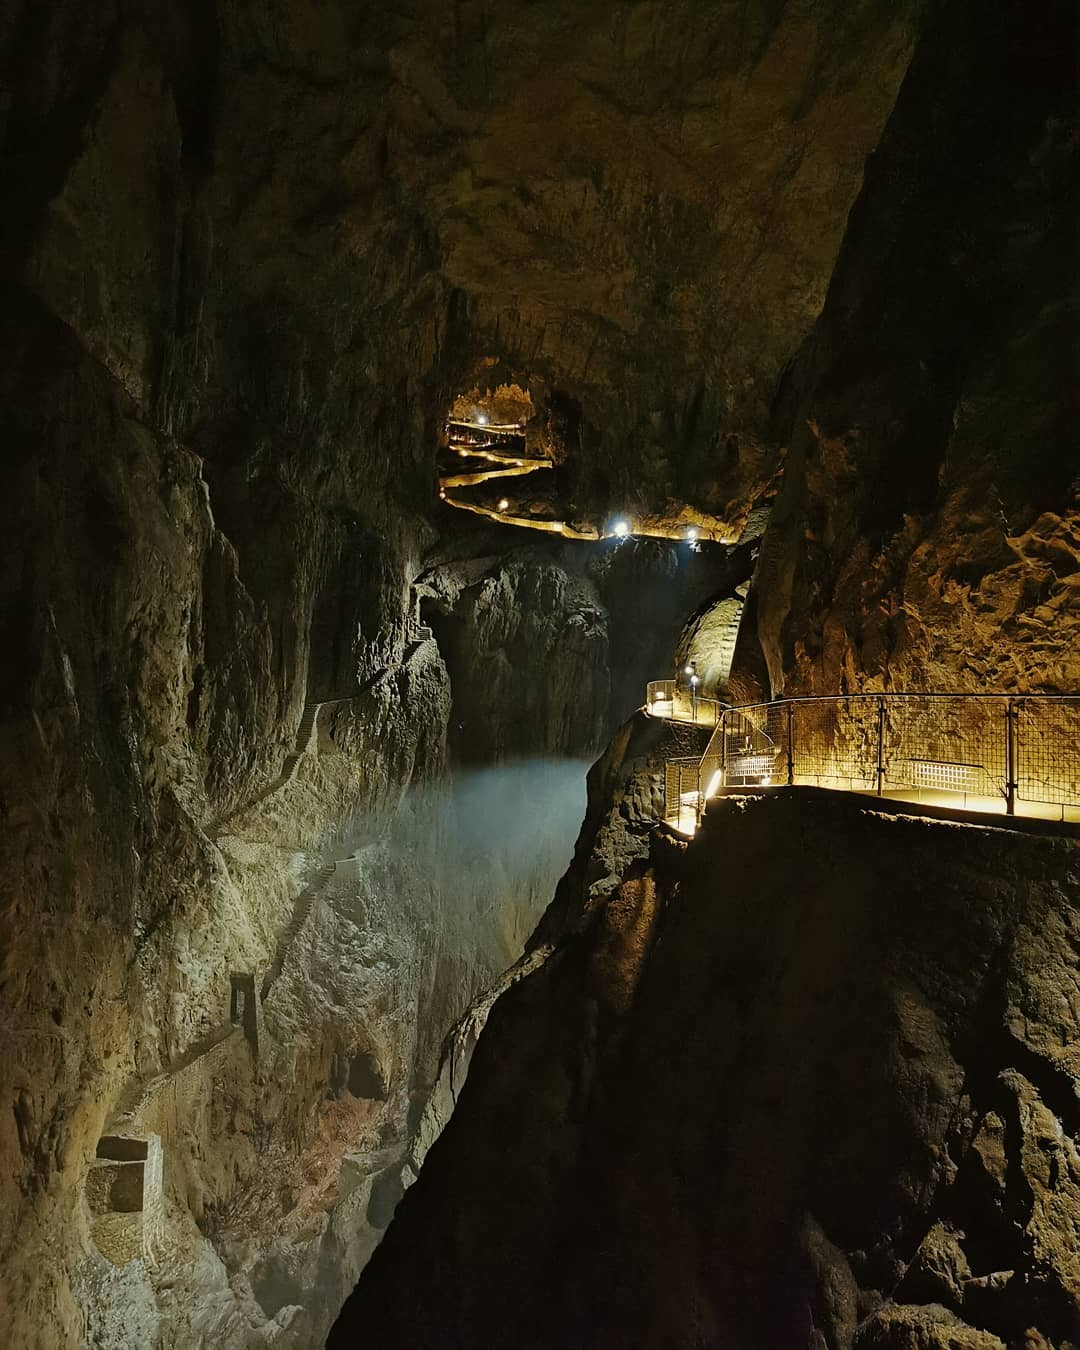 Les grottes de San Canziano